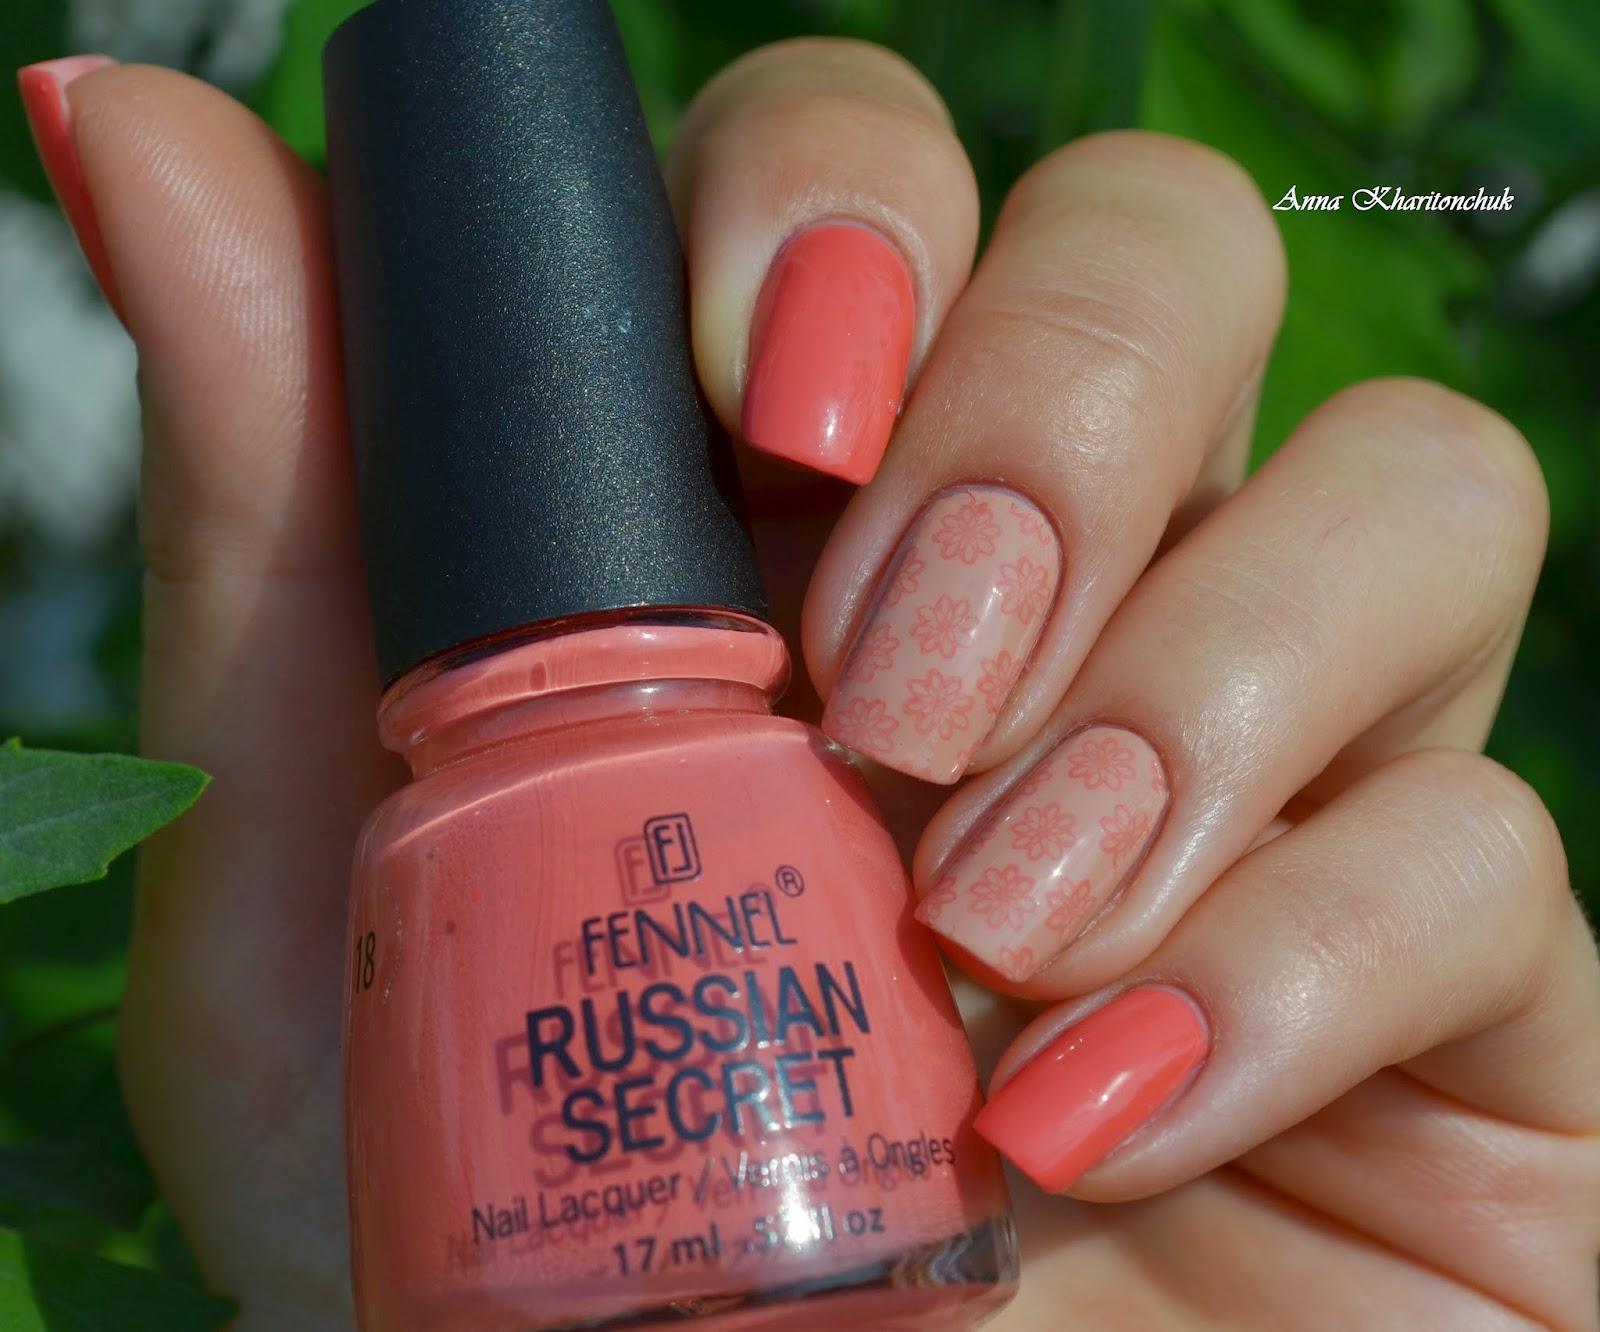 Дуэт Fennel Russian Secret # 3 и Fennel Russian Secret # 18 и стемпинг Lesly